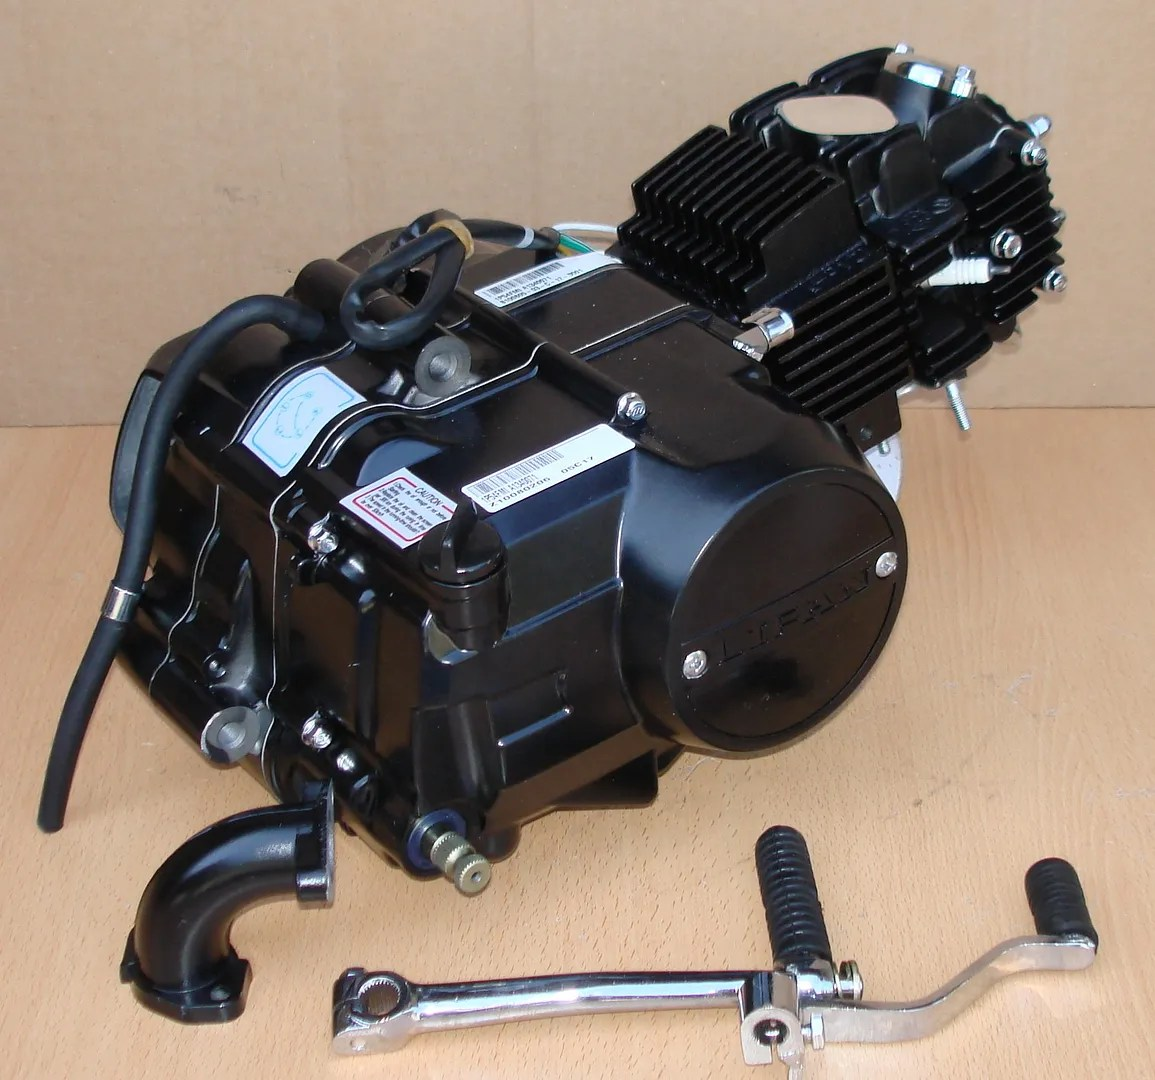 lifan 125cc 1p54fmi engine motor complete kit for honda xr50 crf50 [ 1512 x 1414 Pixel ]